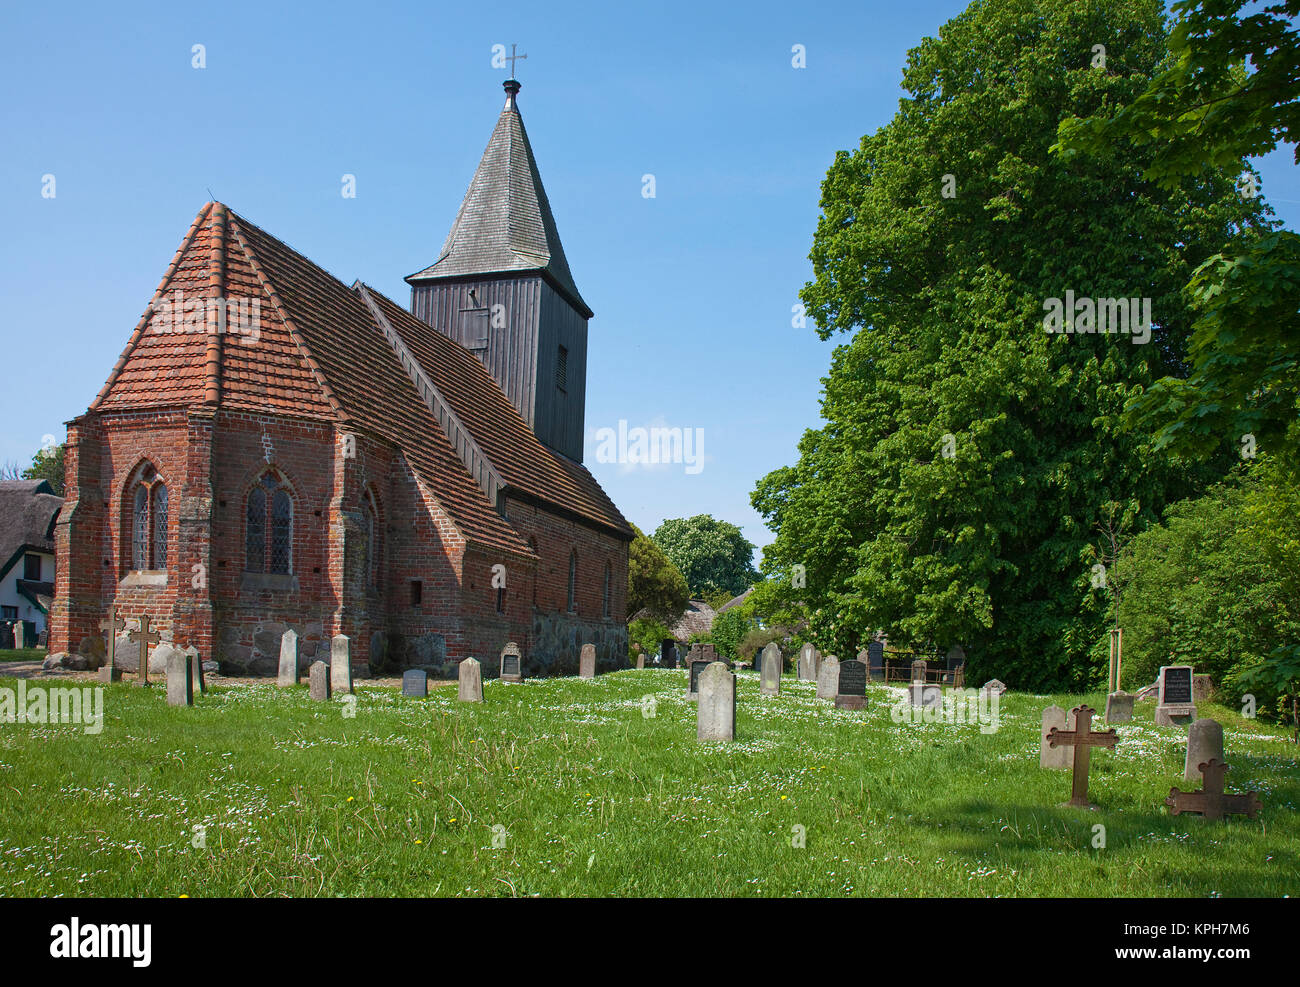 Village church with wooden tower, gotic style, cementary, Gross Zicker, Ruegen island, Mecklenburg-Western Pomerania, - Stock Image